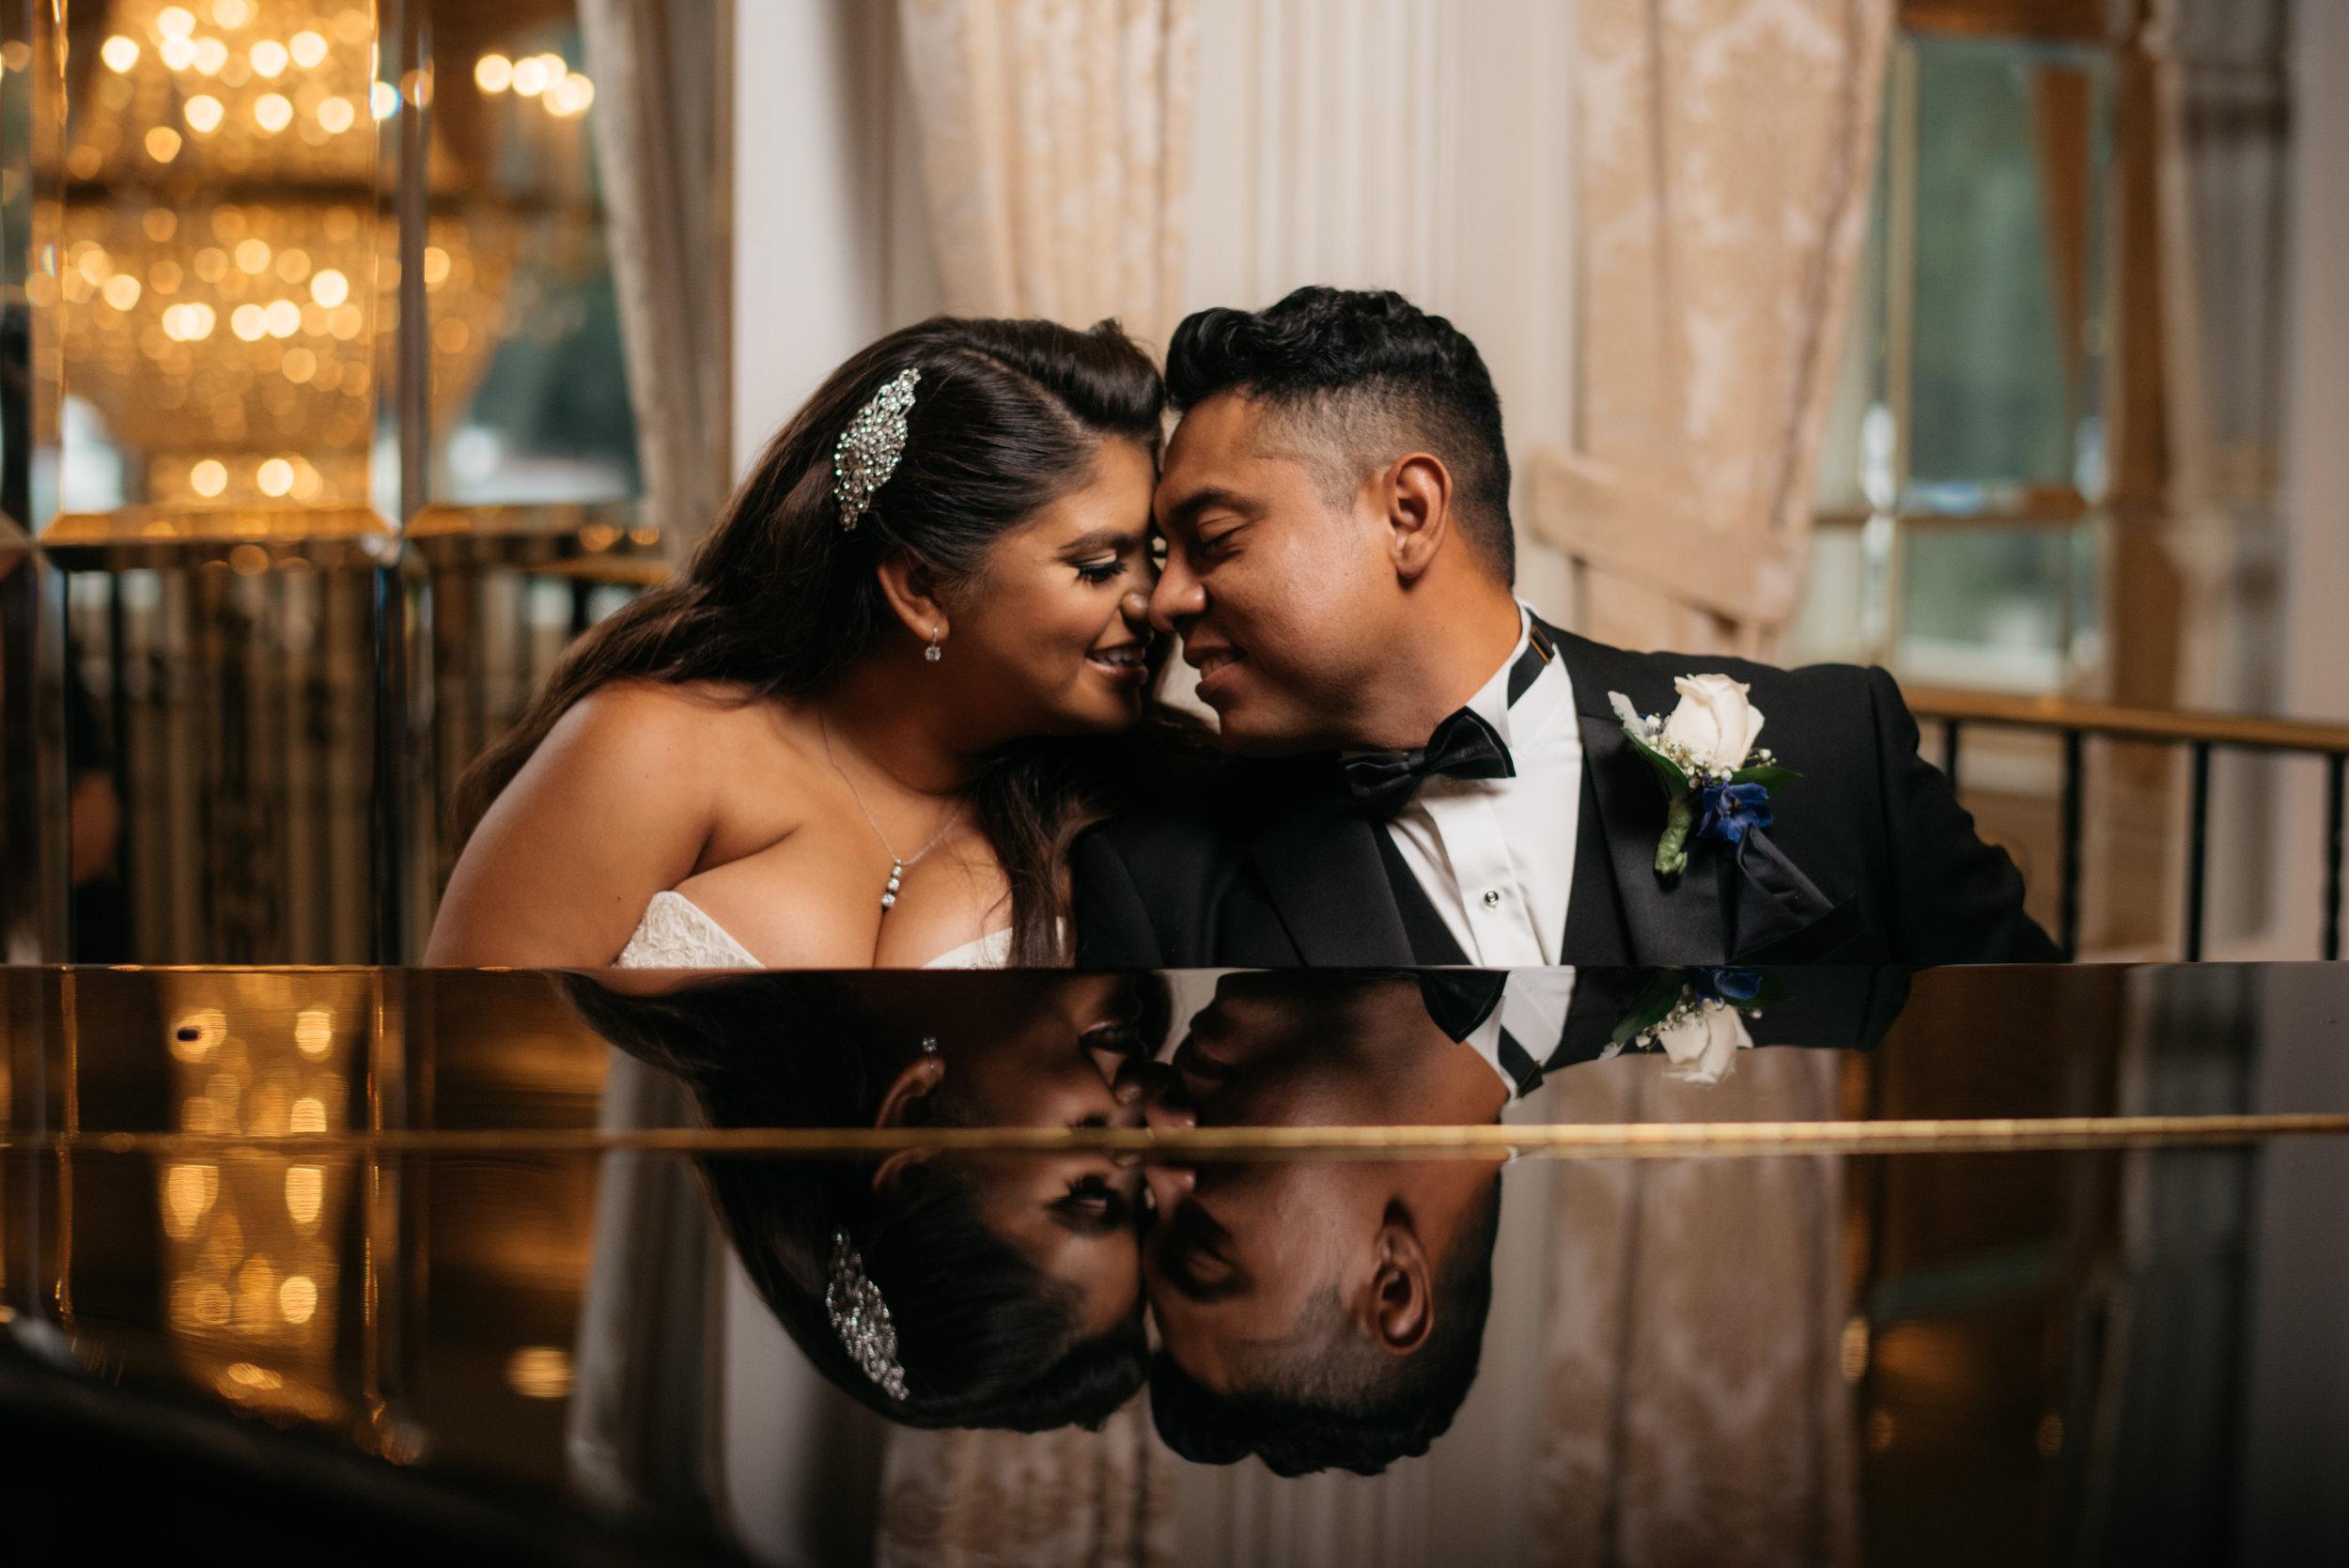 WeddingPhotos | NJPhotographer | Highlights-7-17.jpg